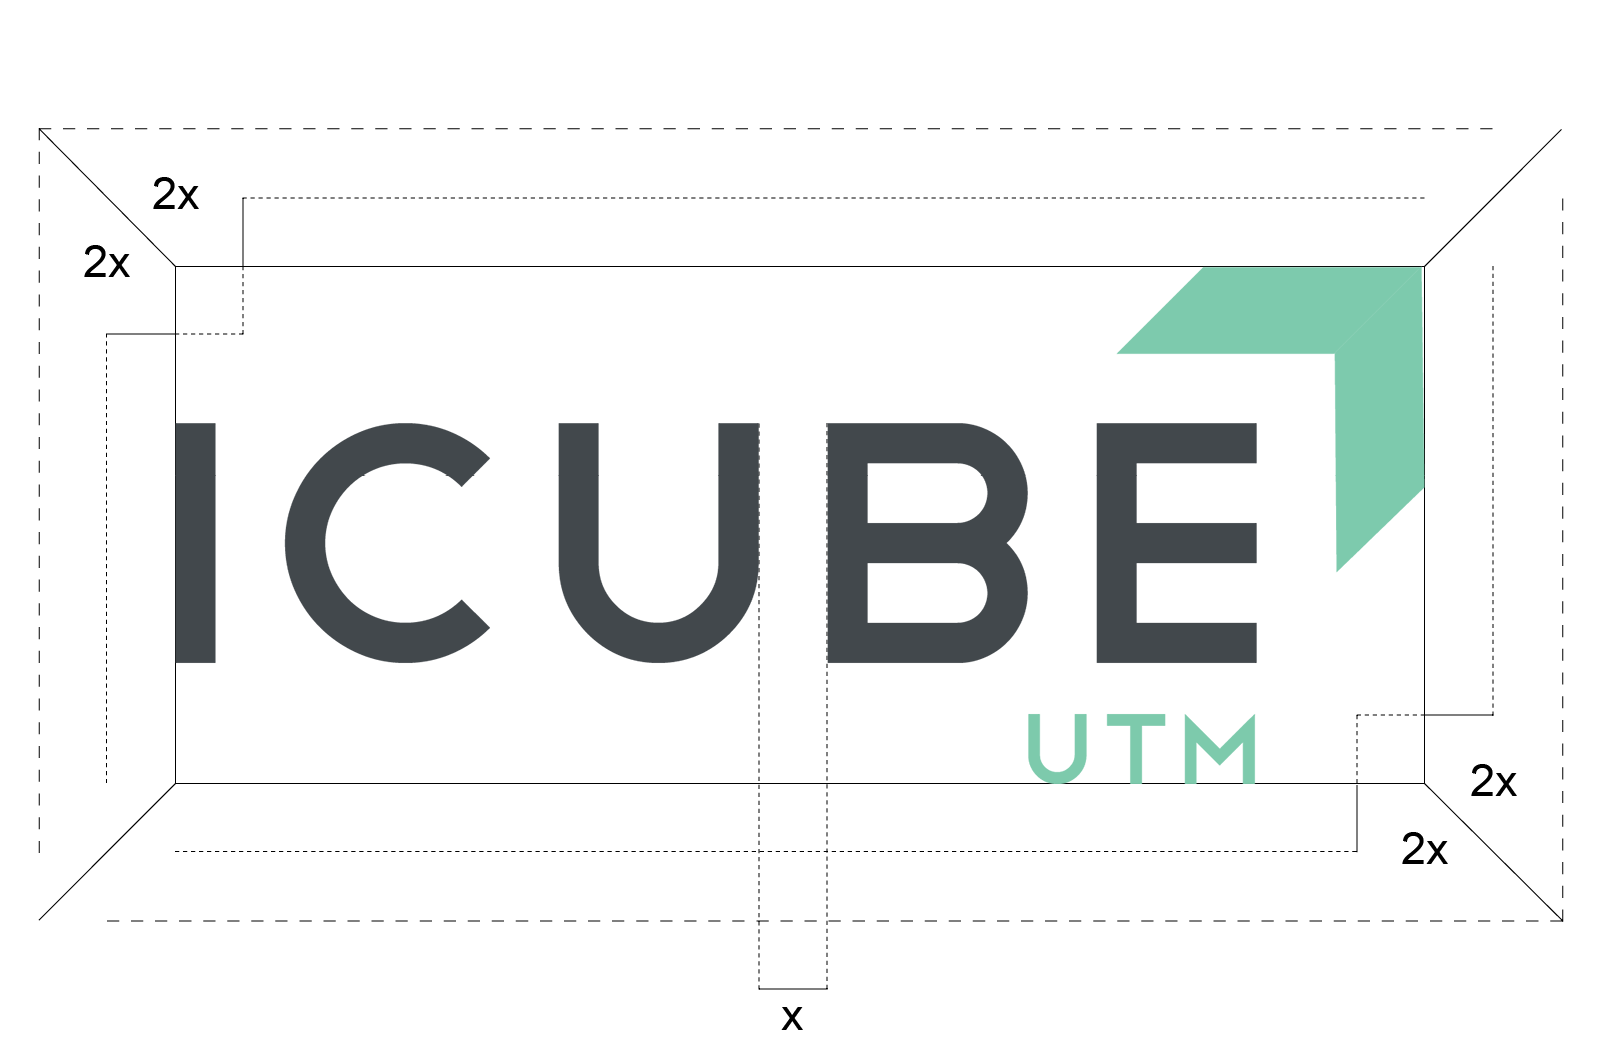 short-logo-protected